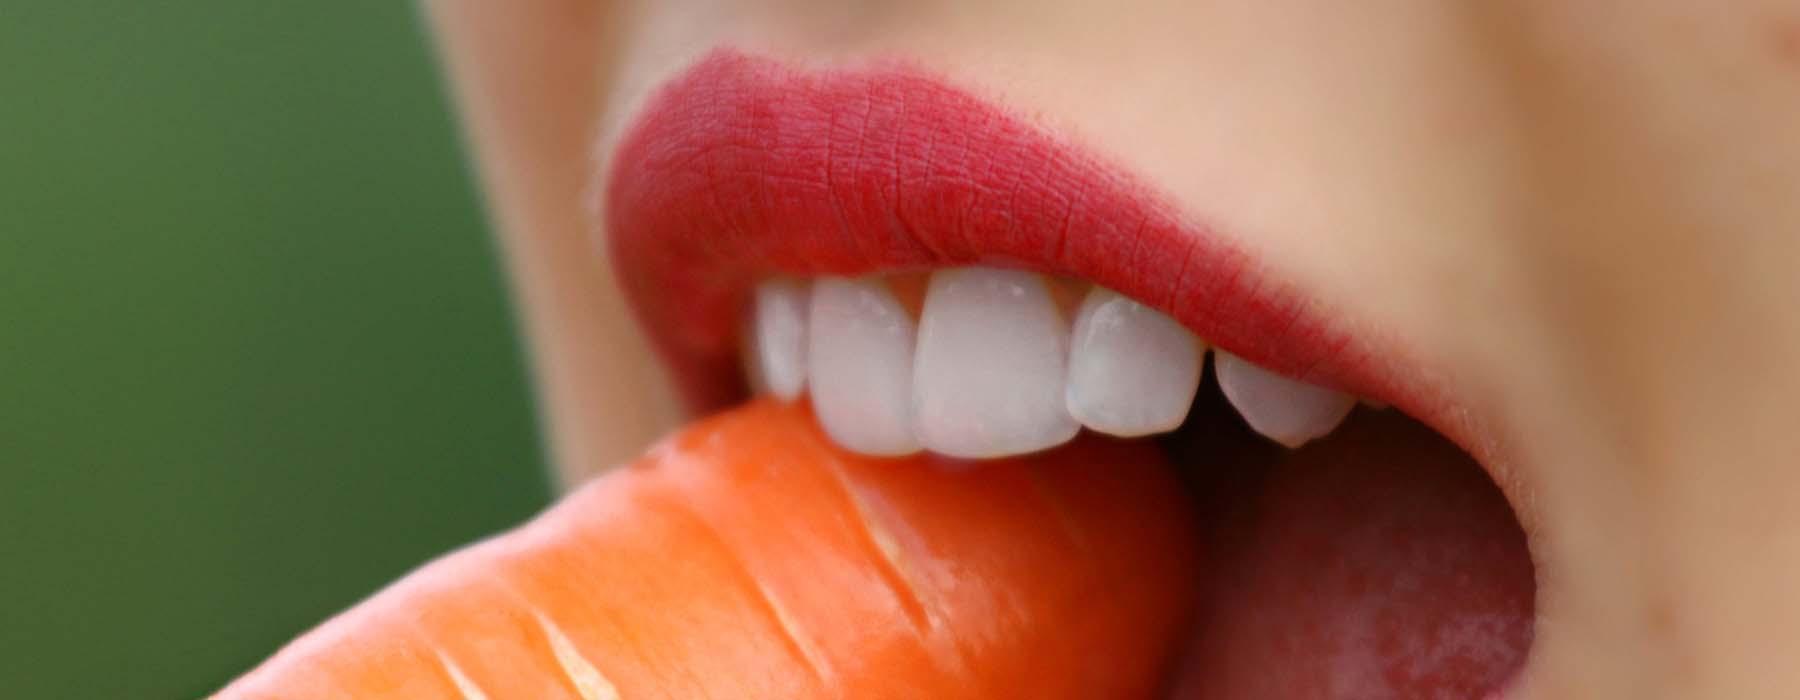 navidades-caries-odontologia-biologica-invisible-bioclinica-marbella